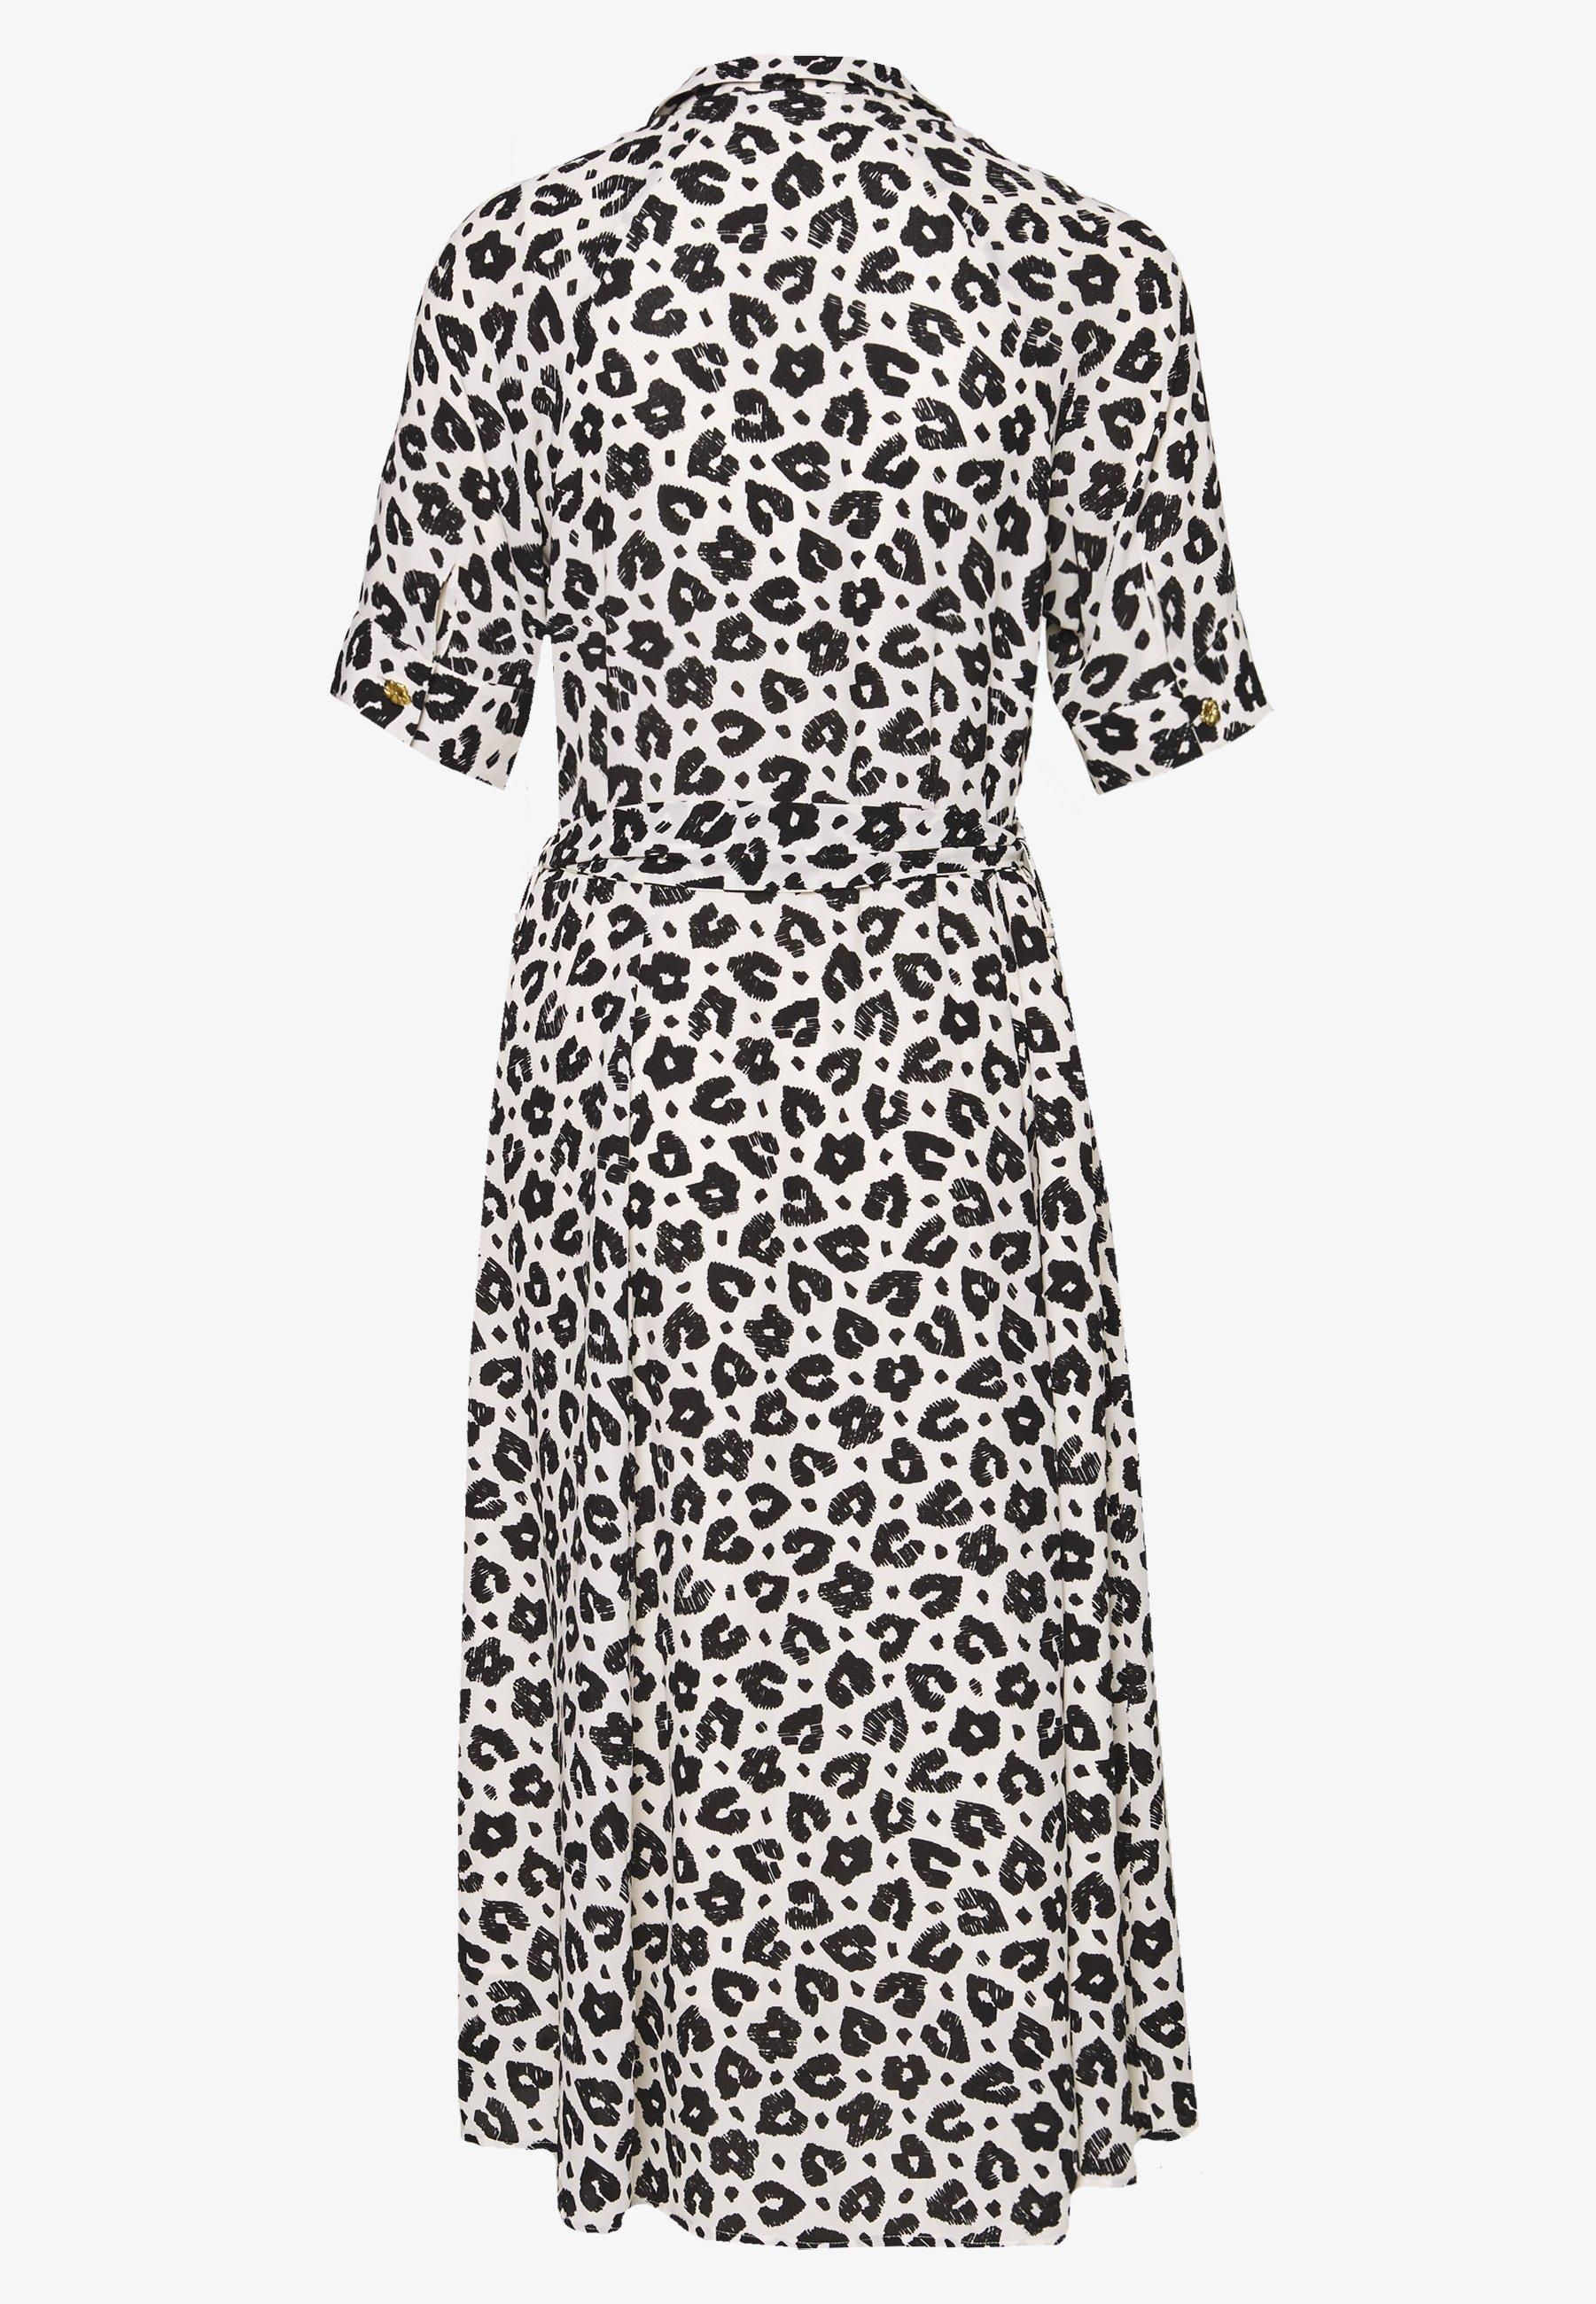 Fabienne Chapot Brizo Dress - Vapaa-ajan Mekko Cream White/black